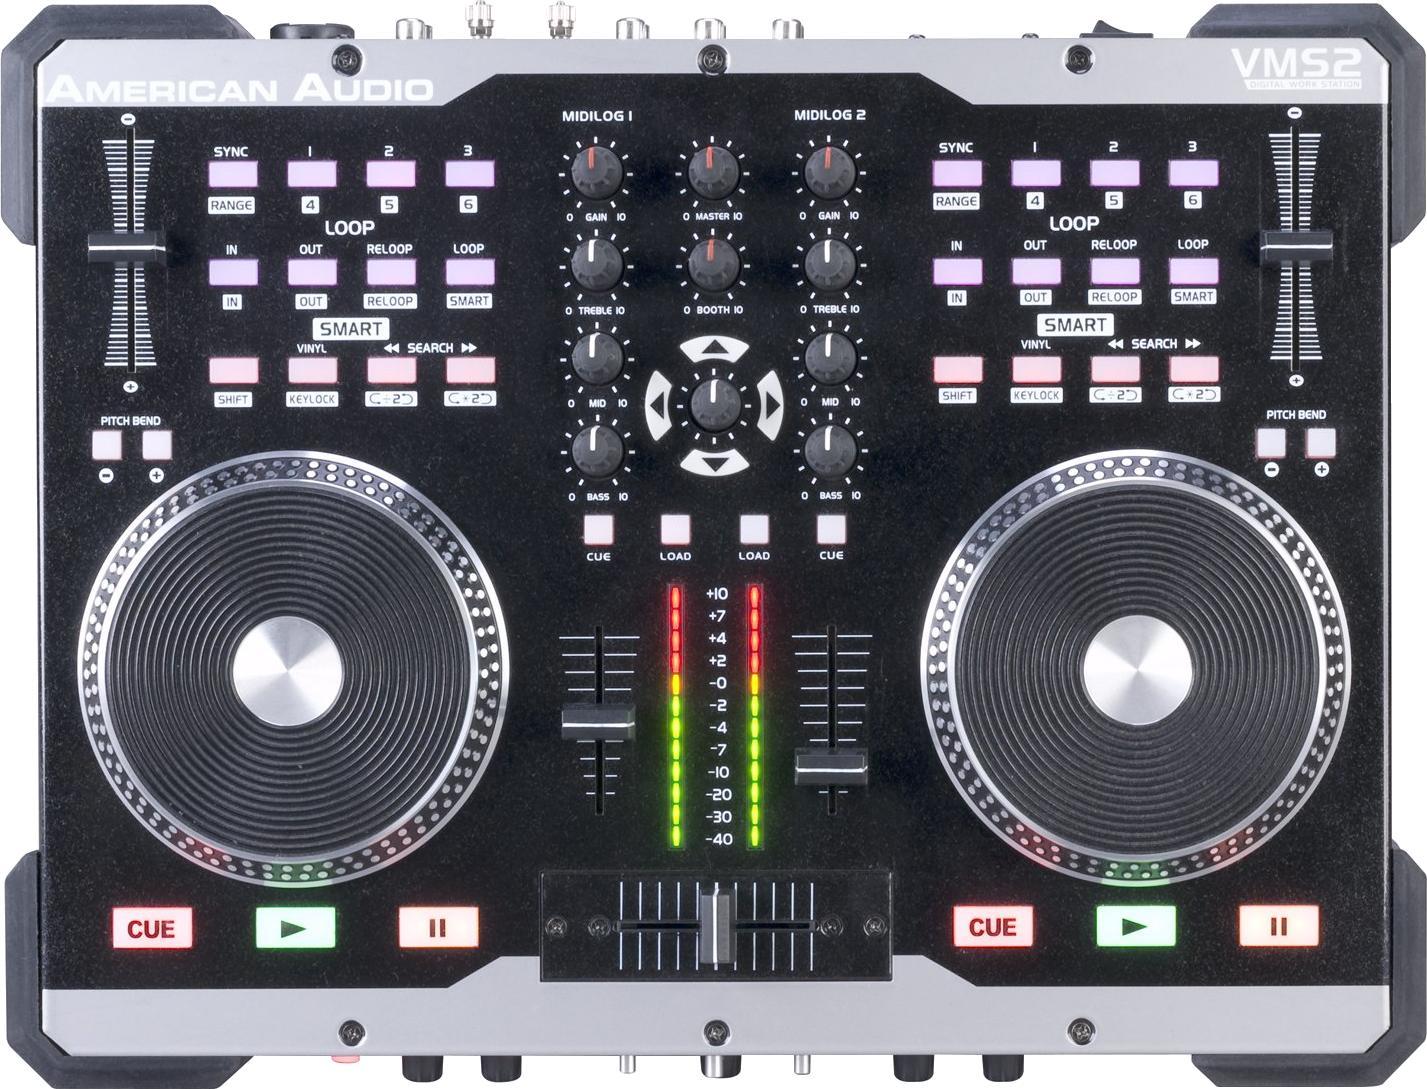 American Audio VMS 2